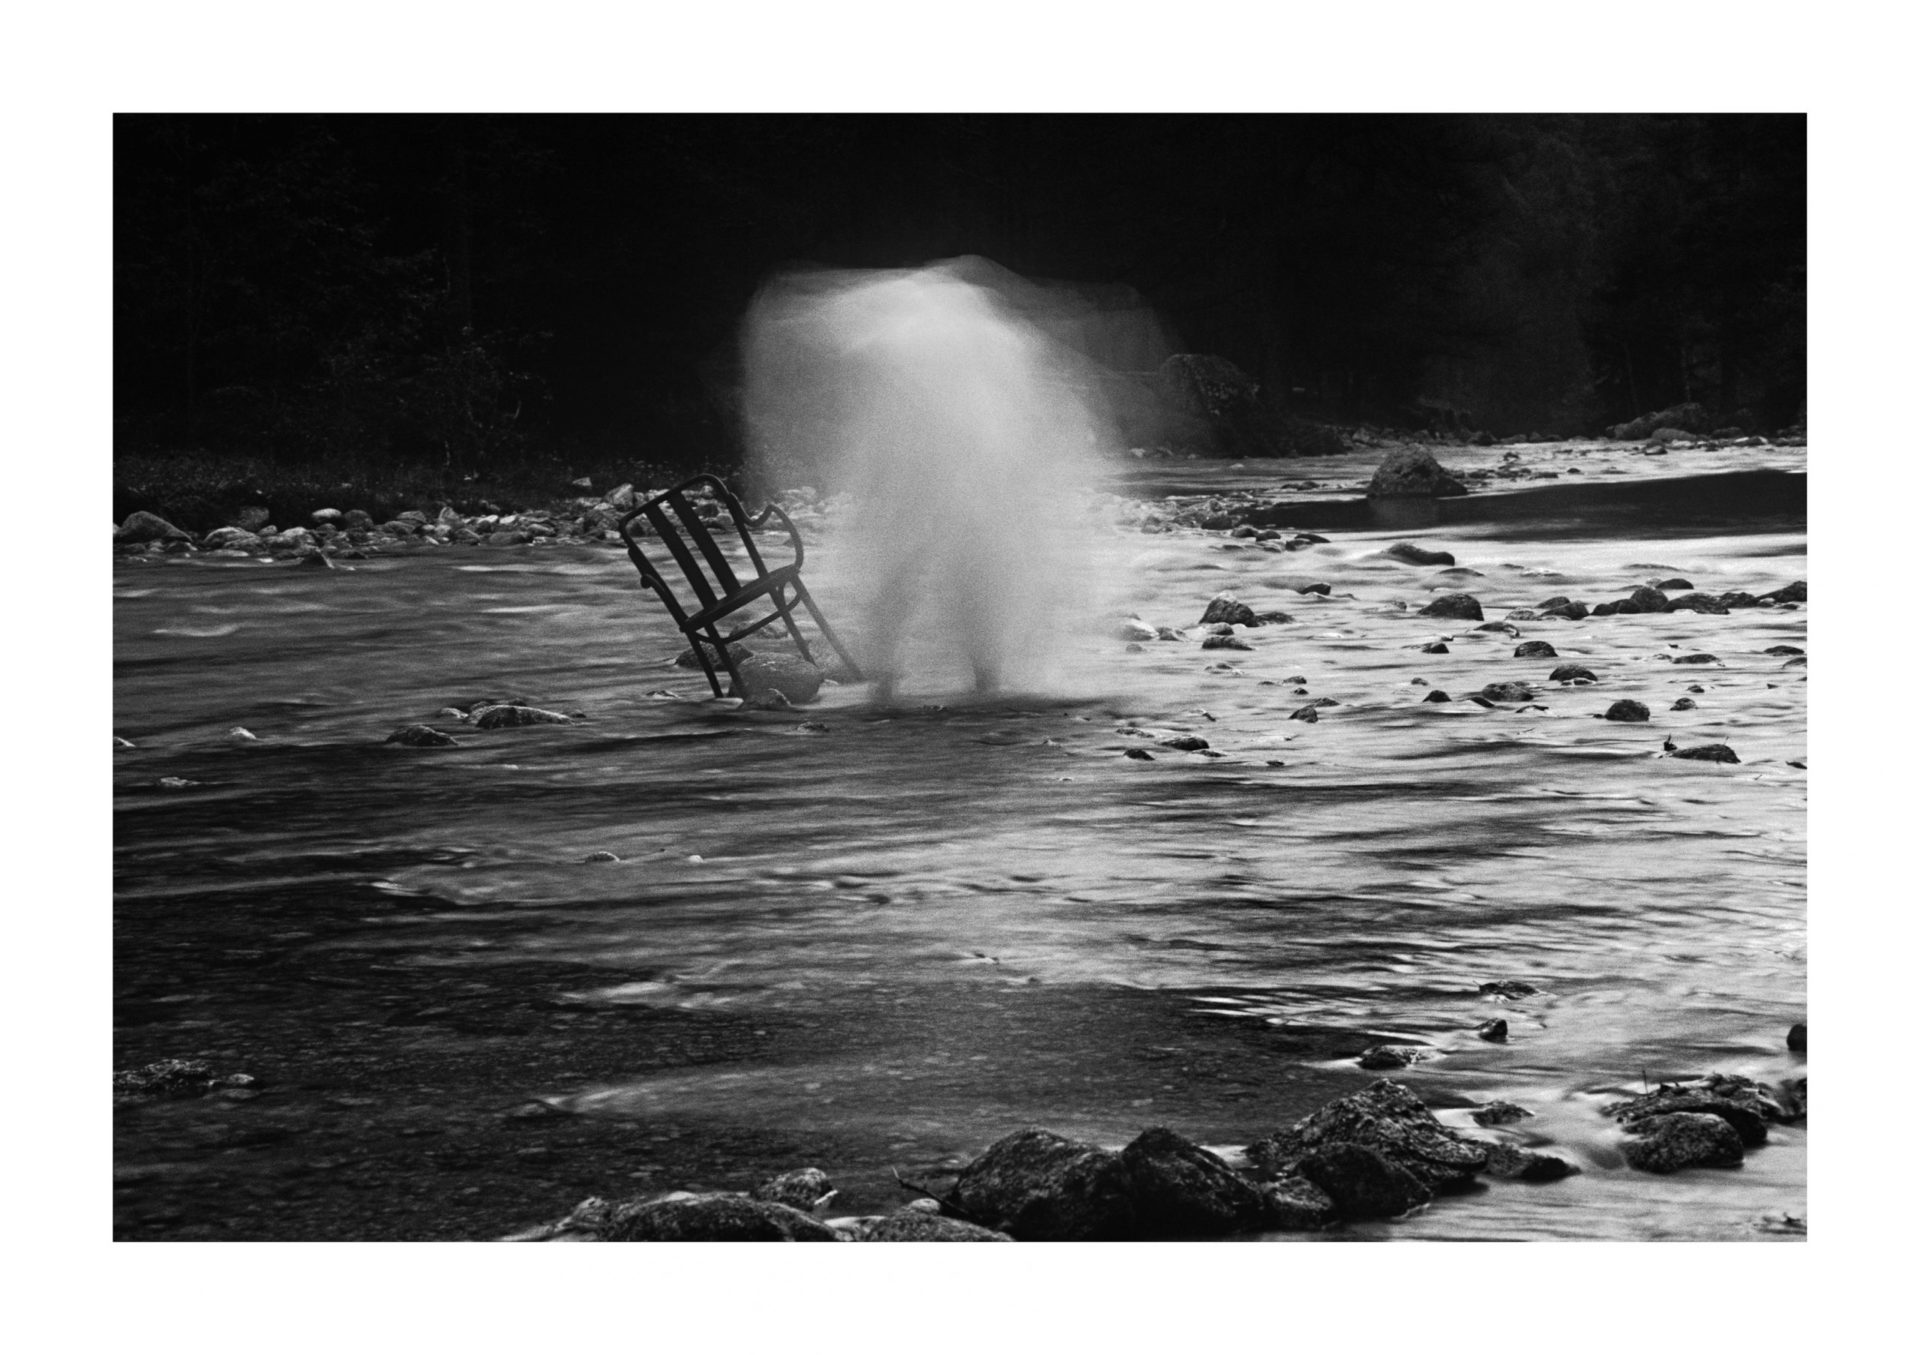 lato oscuro 2 scaled - Milano Photofestival